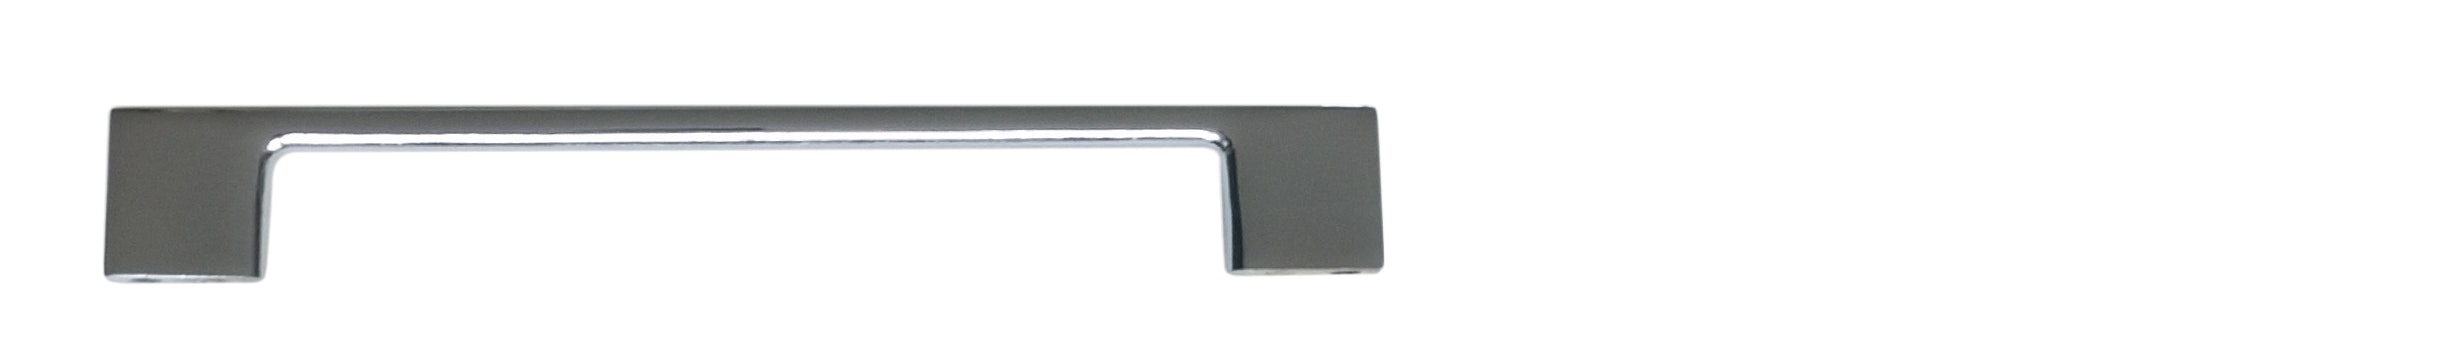 Handtag Noro Multi Krom C-C 160mm